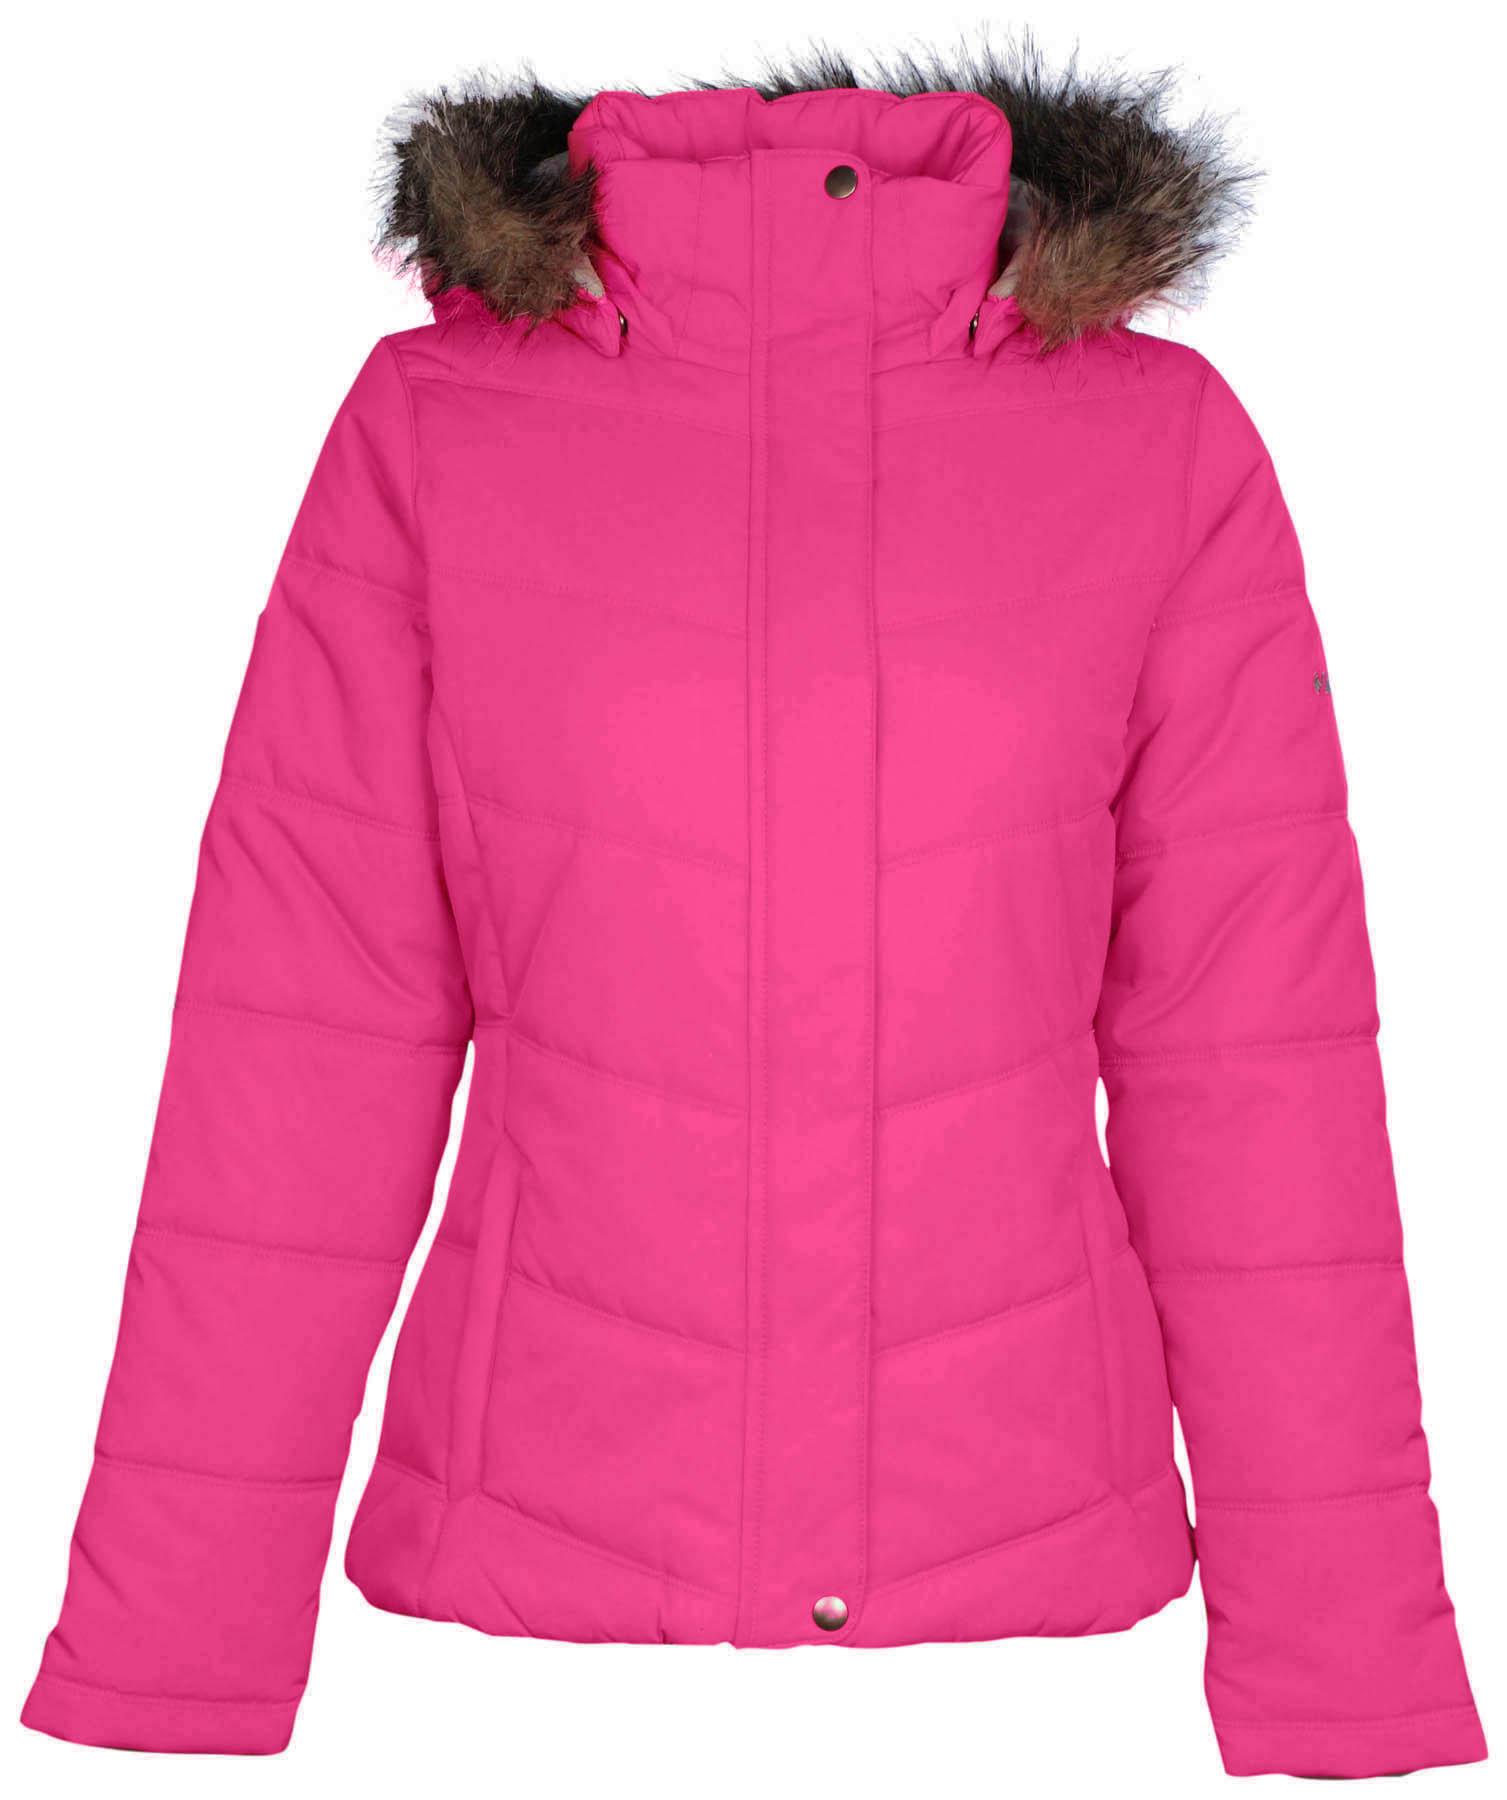 Columbia Women's Simply Snowy II Insulated Jacket XS Pink Ice | eBay